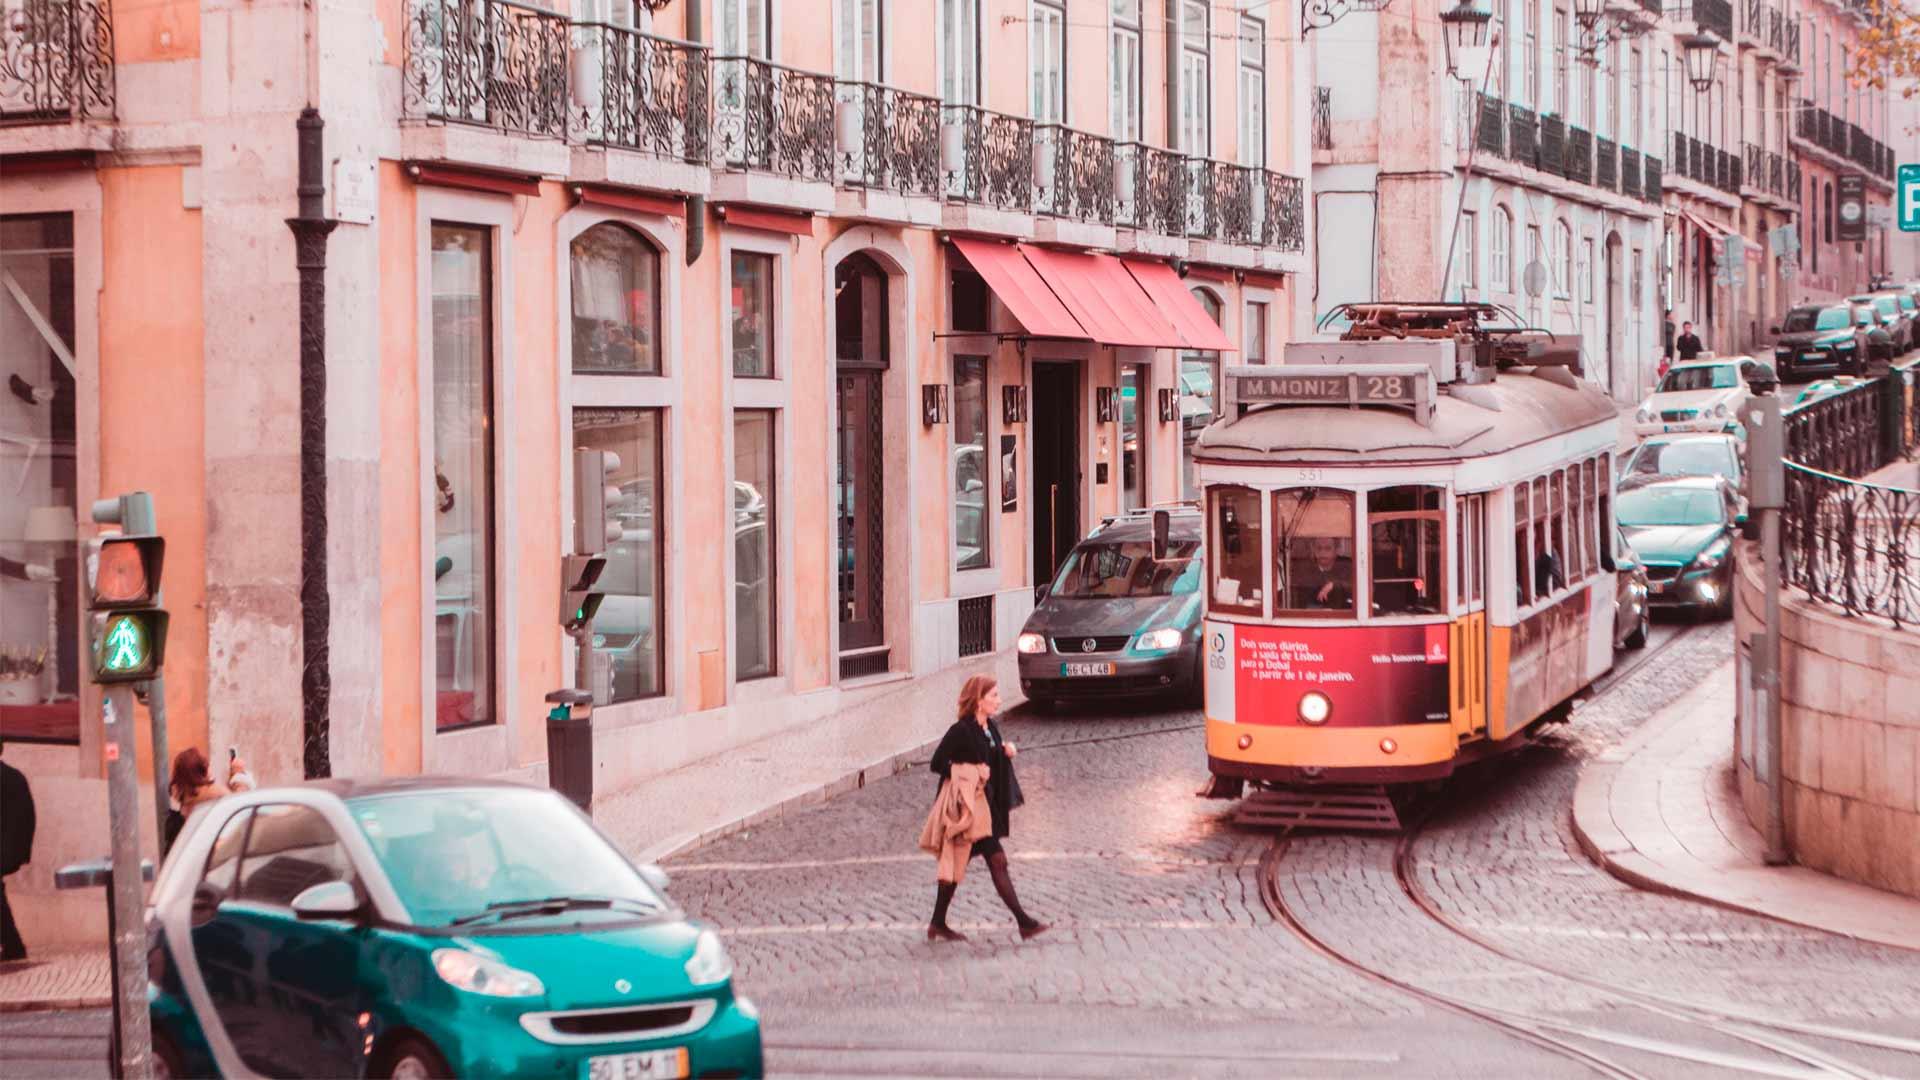 Vista do centro de Lisboa, capital de Portugal